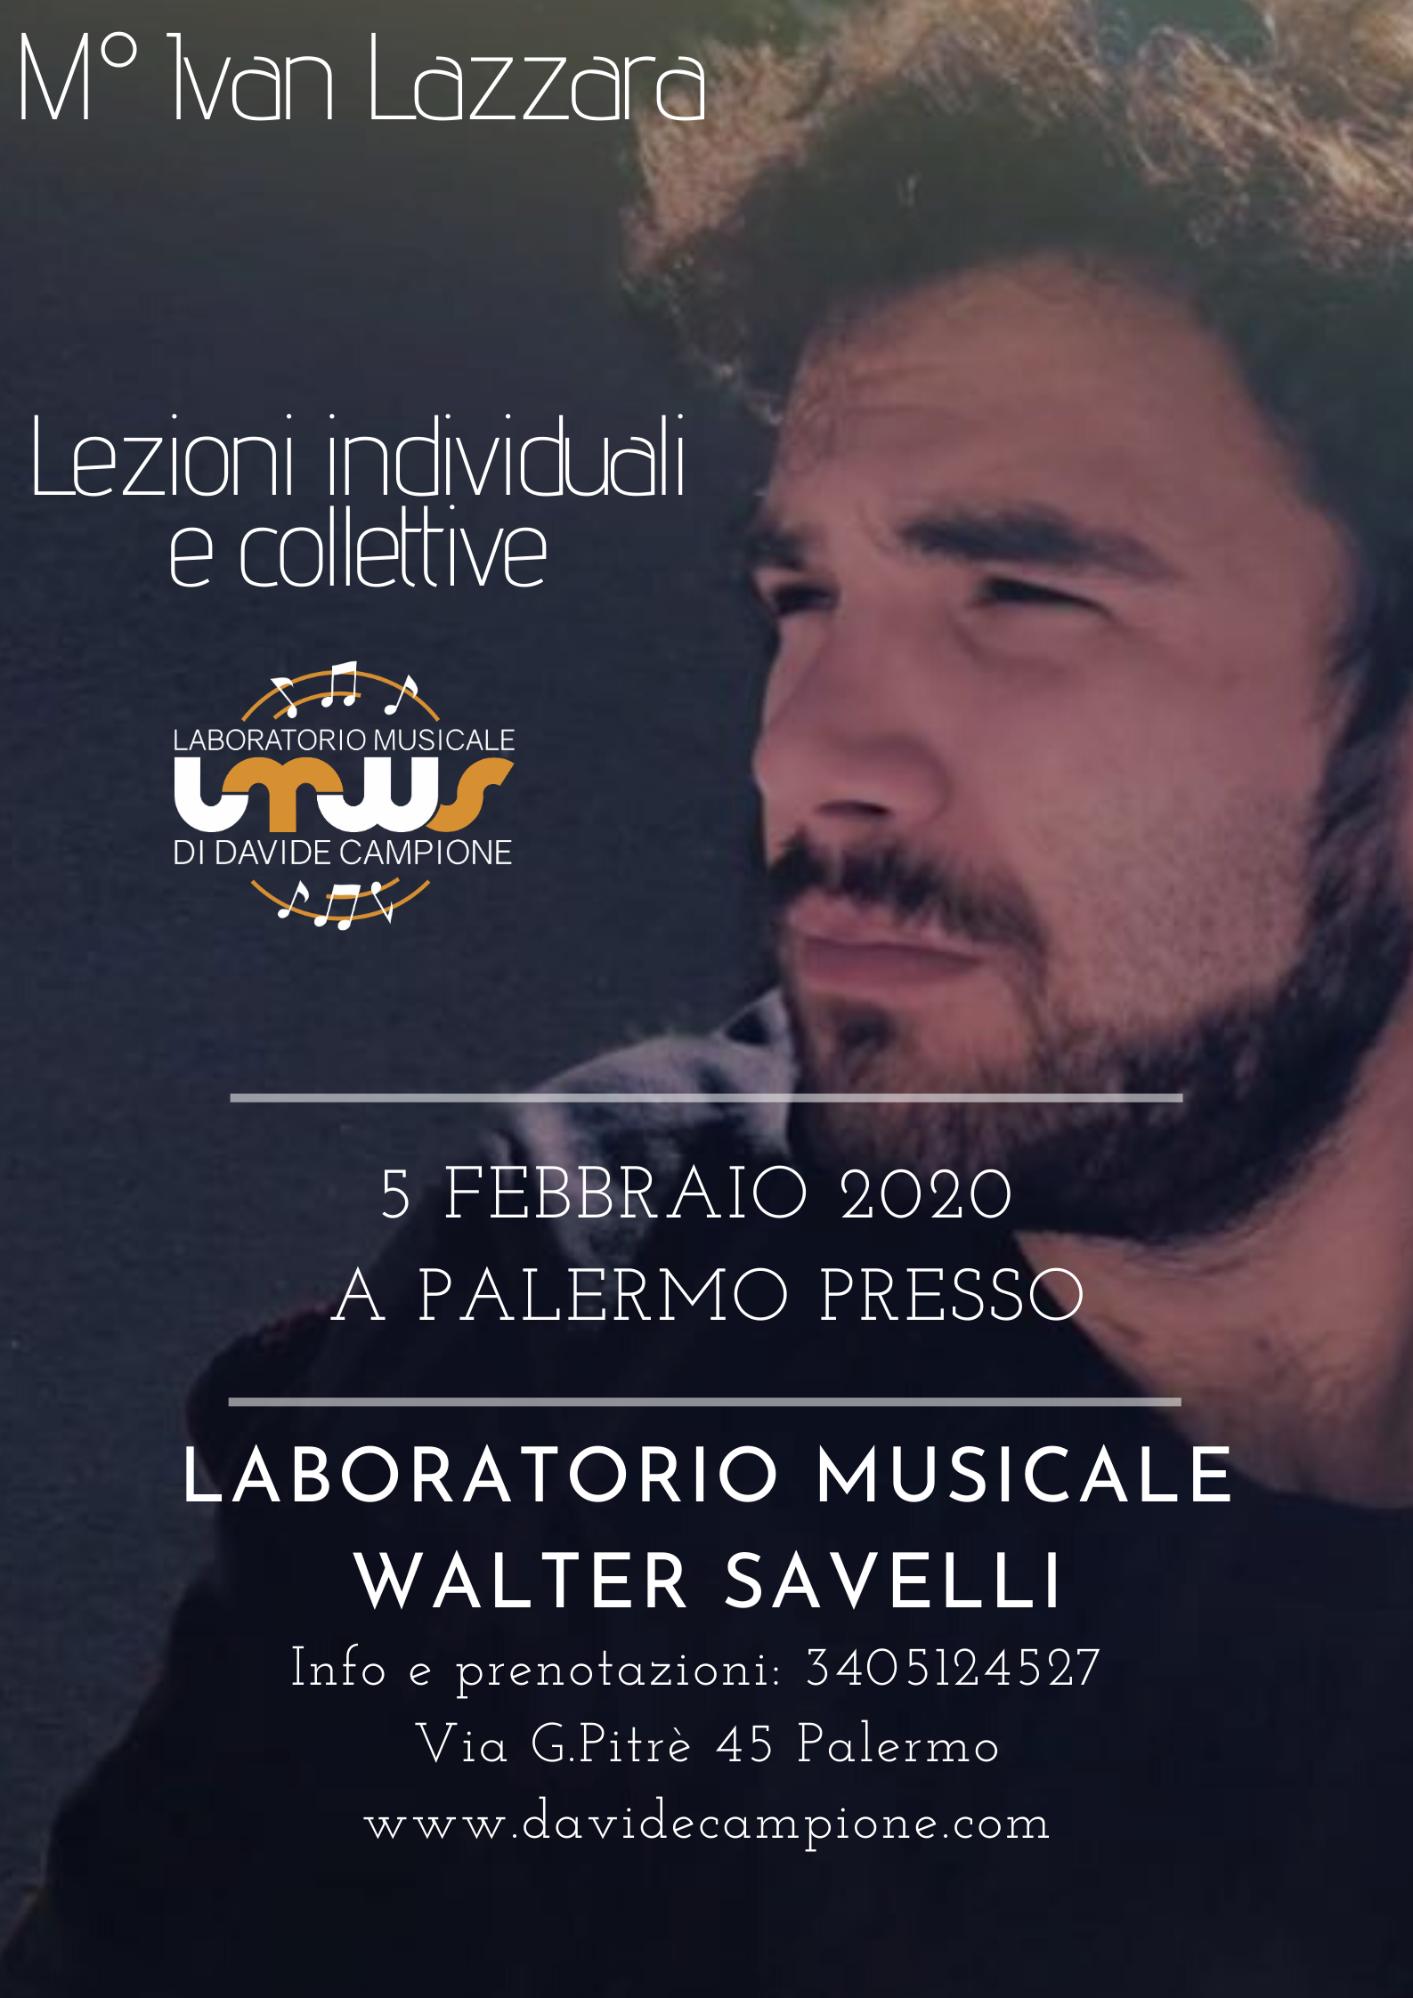 M Ivan Lazzara Laboratorio Musicale Walter Savelli